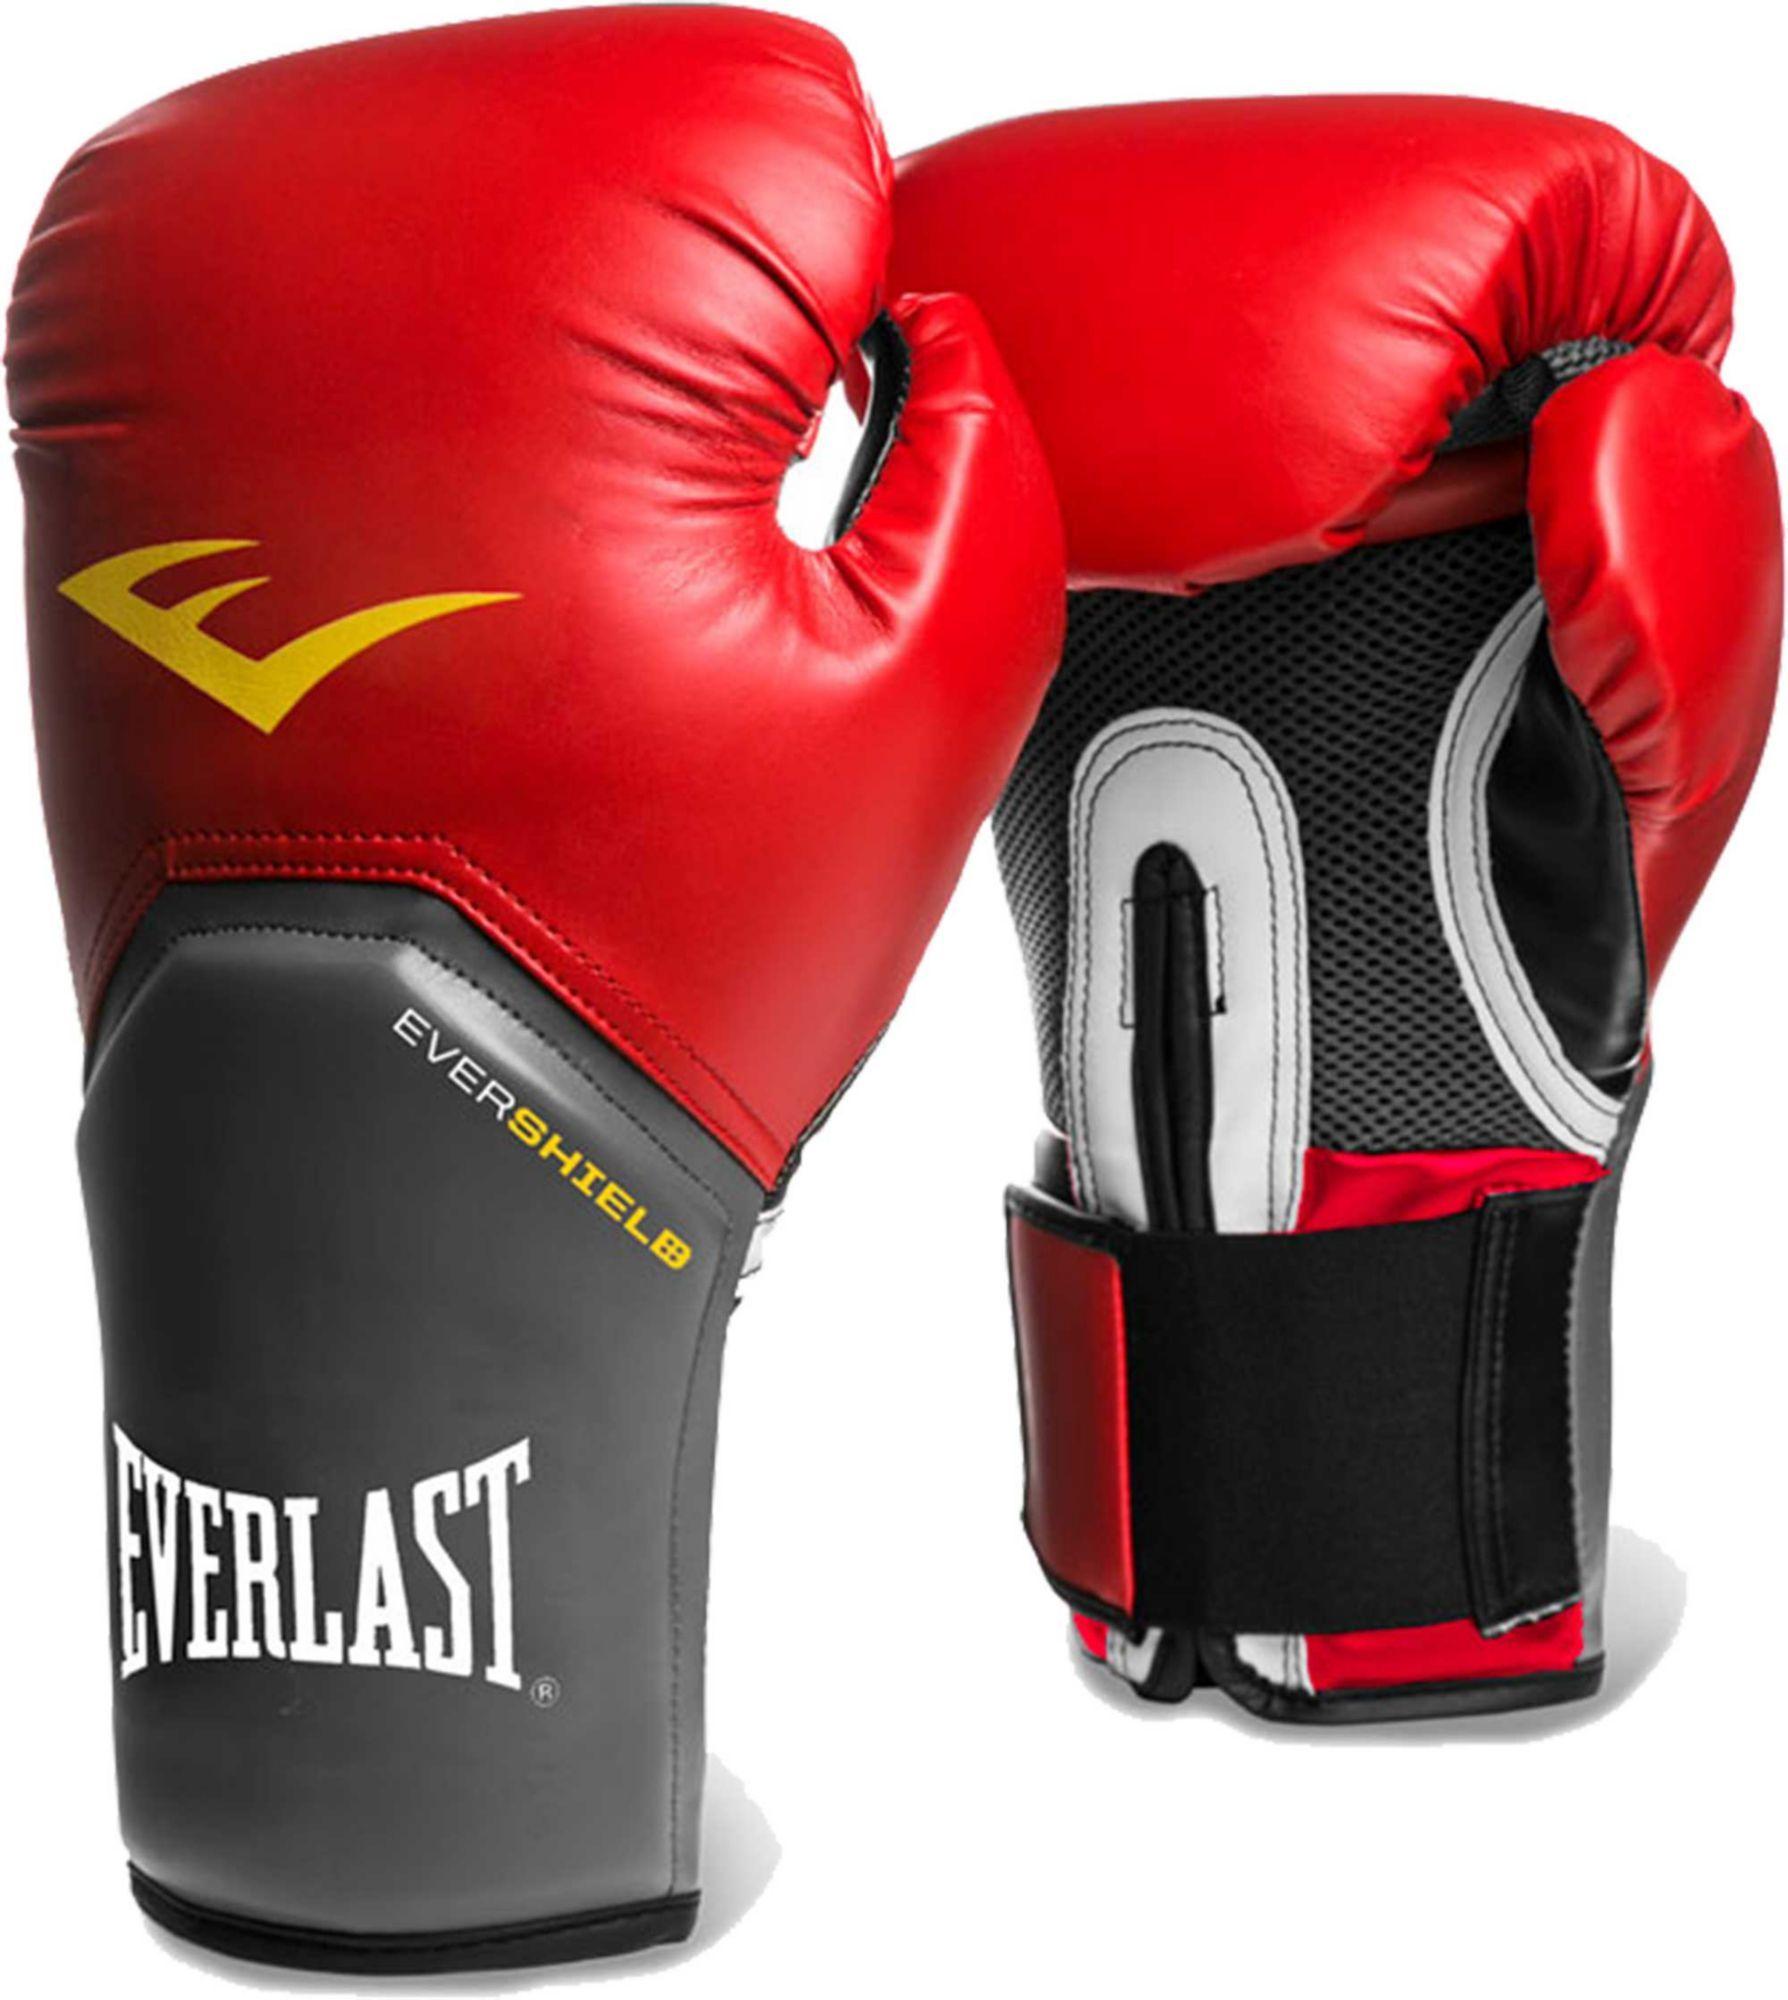 Everlast Pro Style Elite Training Gloves, Red in 2019